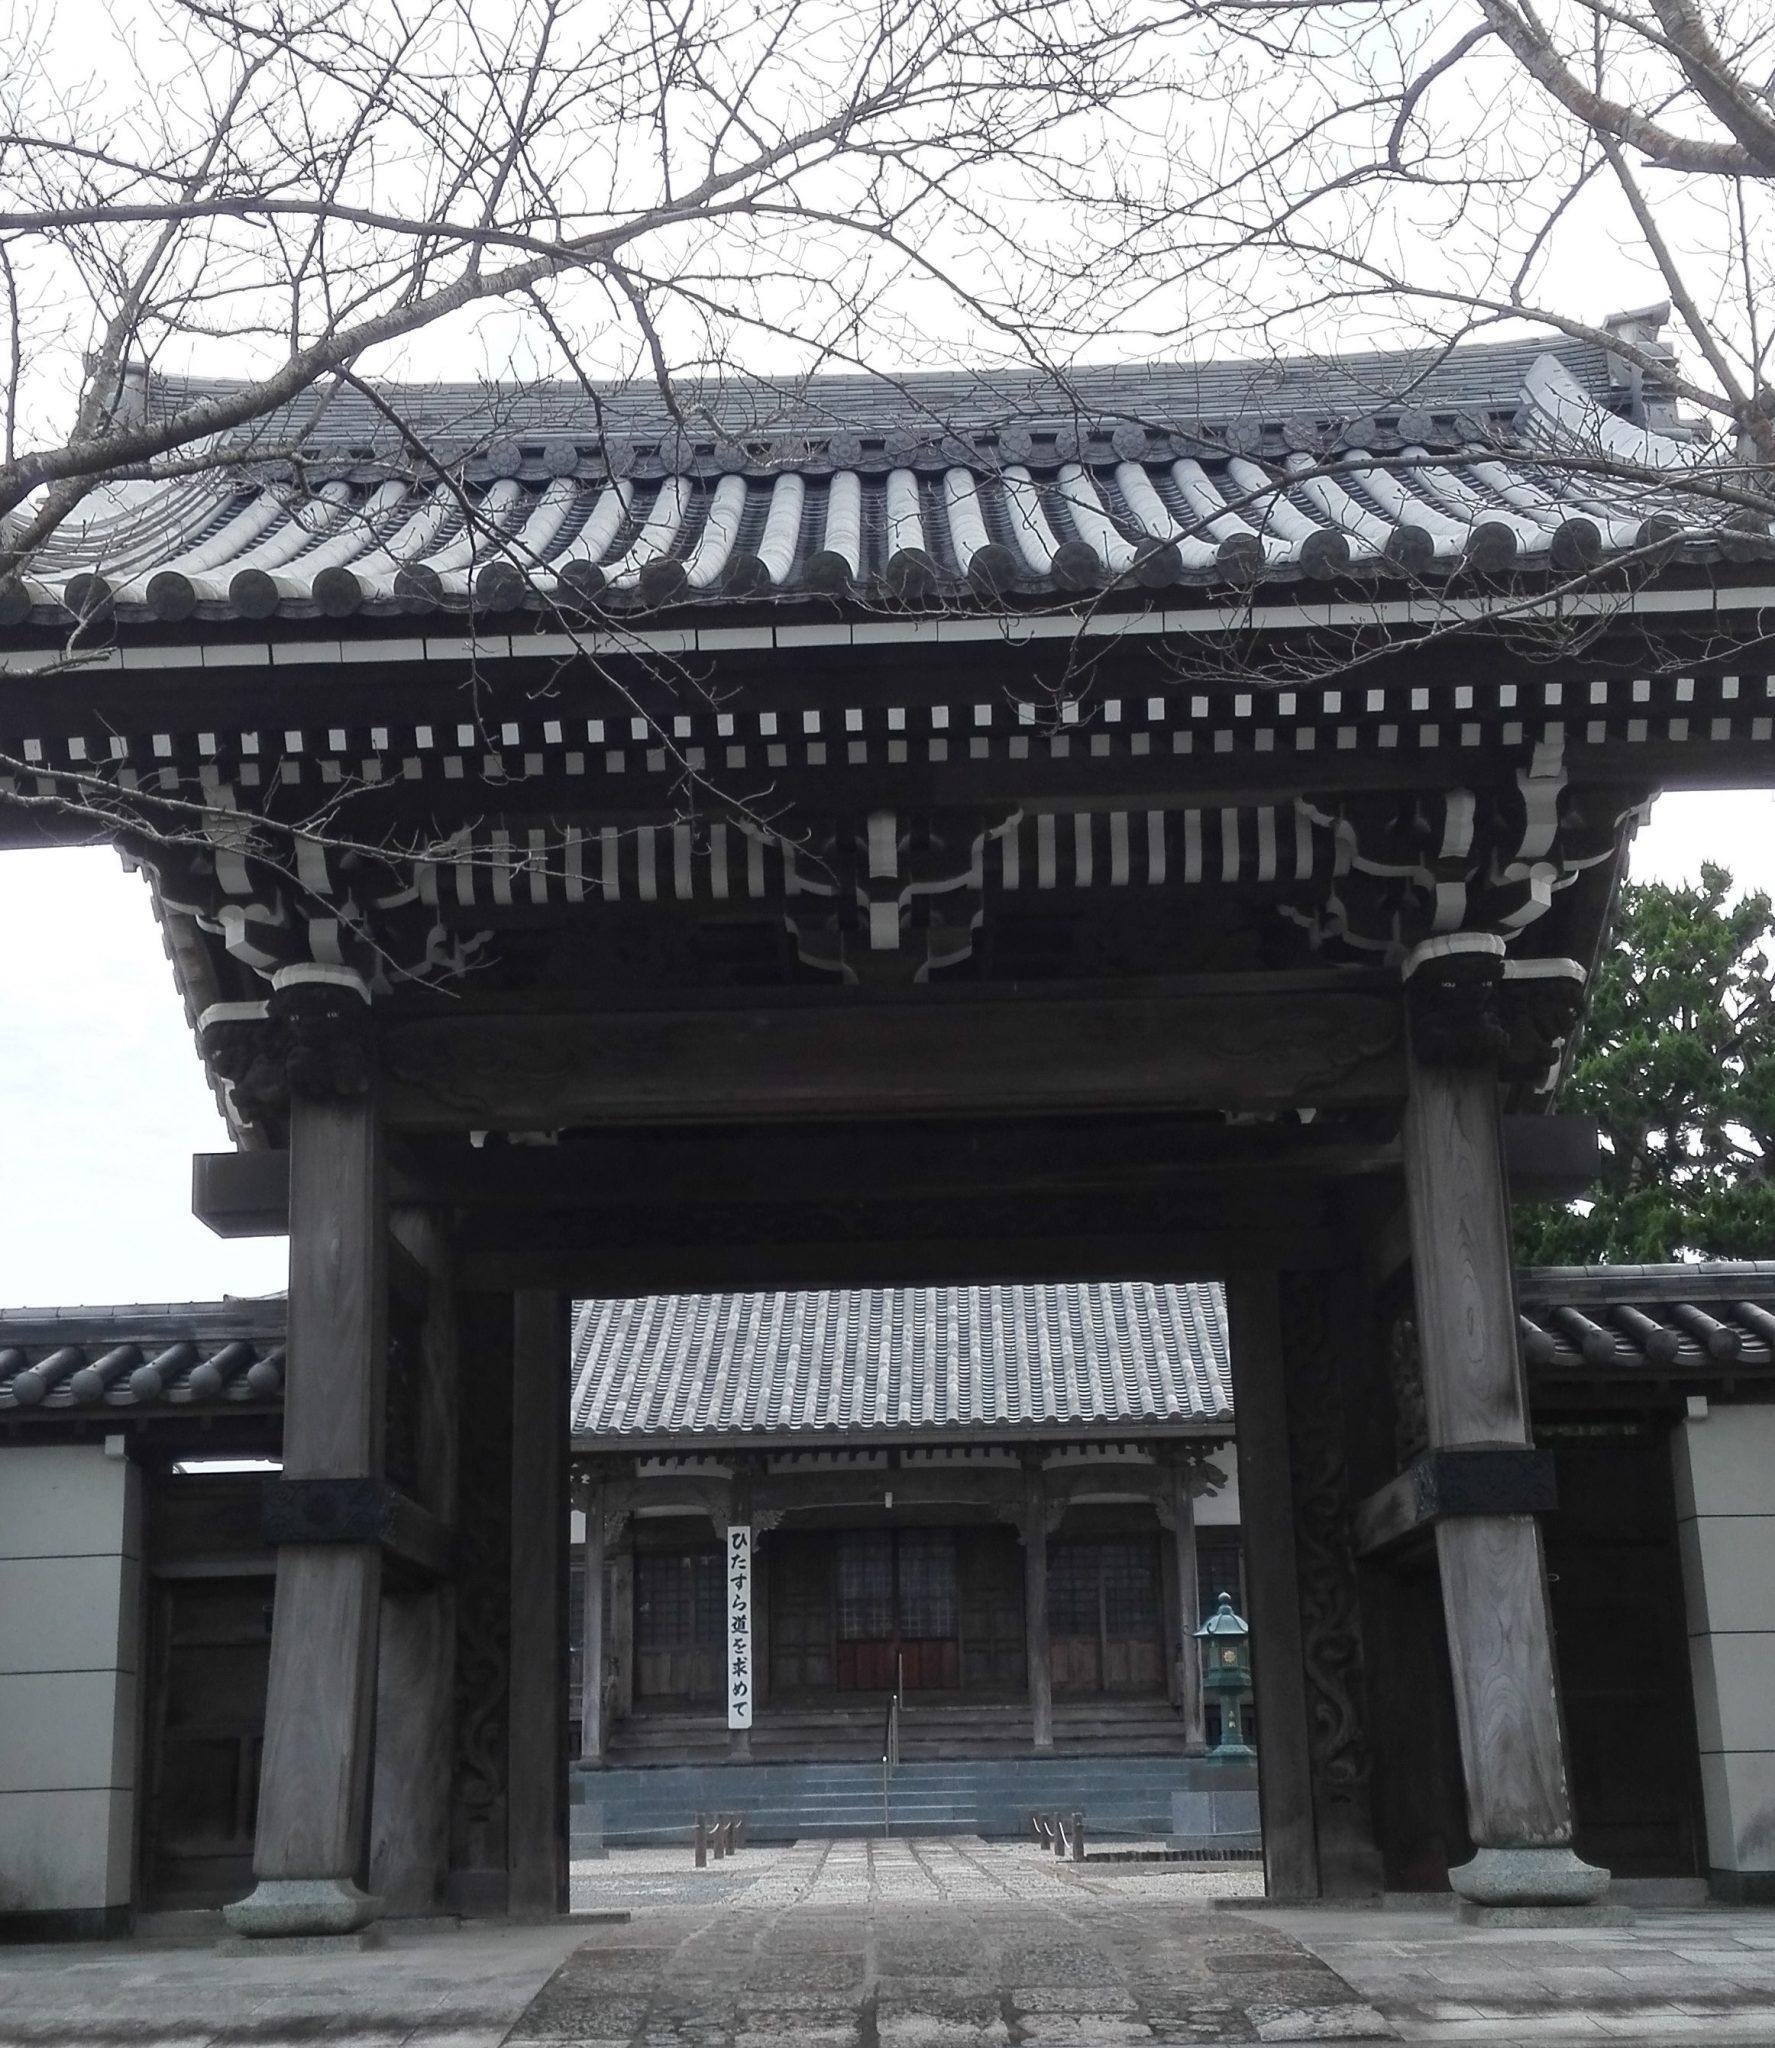 Buddyjska-brama-mon-Imari-Japonia-autor-Ania-Anna-Kotula-z-Tour-Guide-Service-Gdańsk